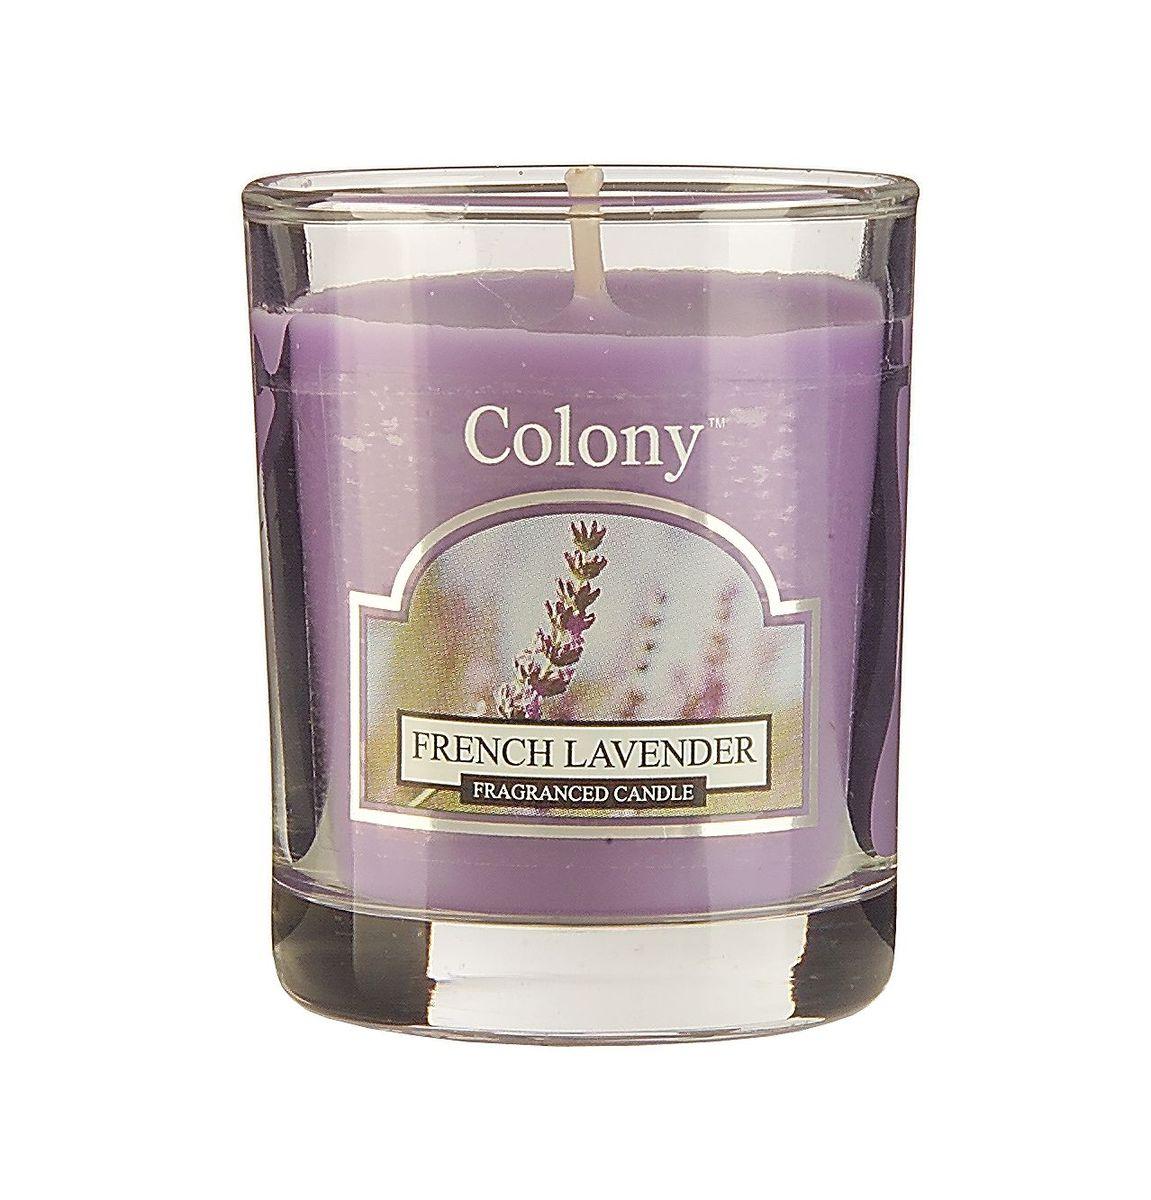 Свеча ароматическая лампадная Wax Lyrical Французская лаванда, 14 часов, 130 г wax depilatory